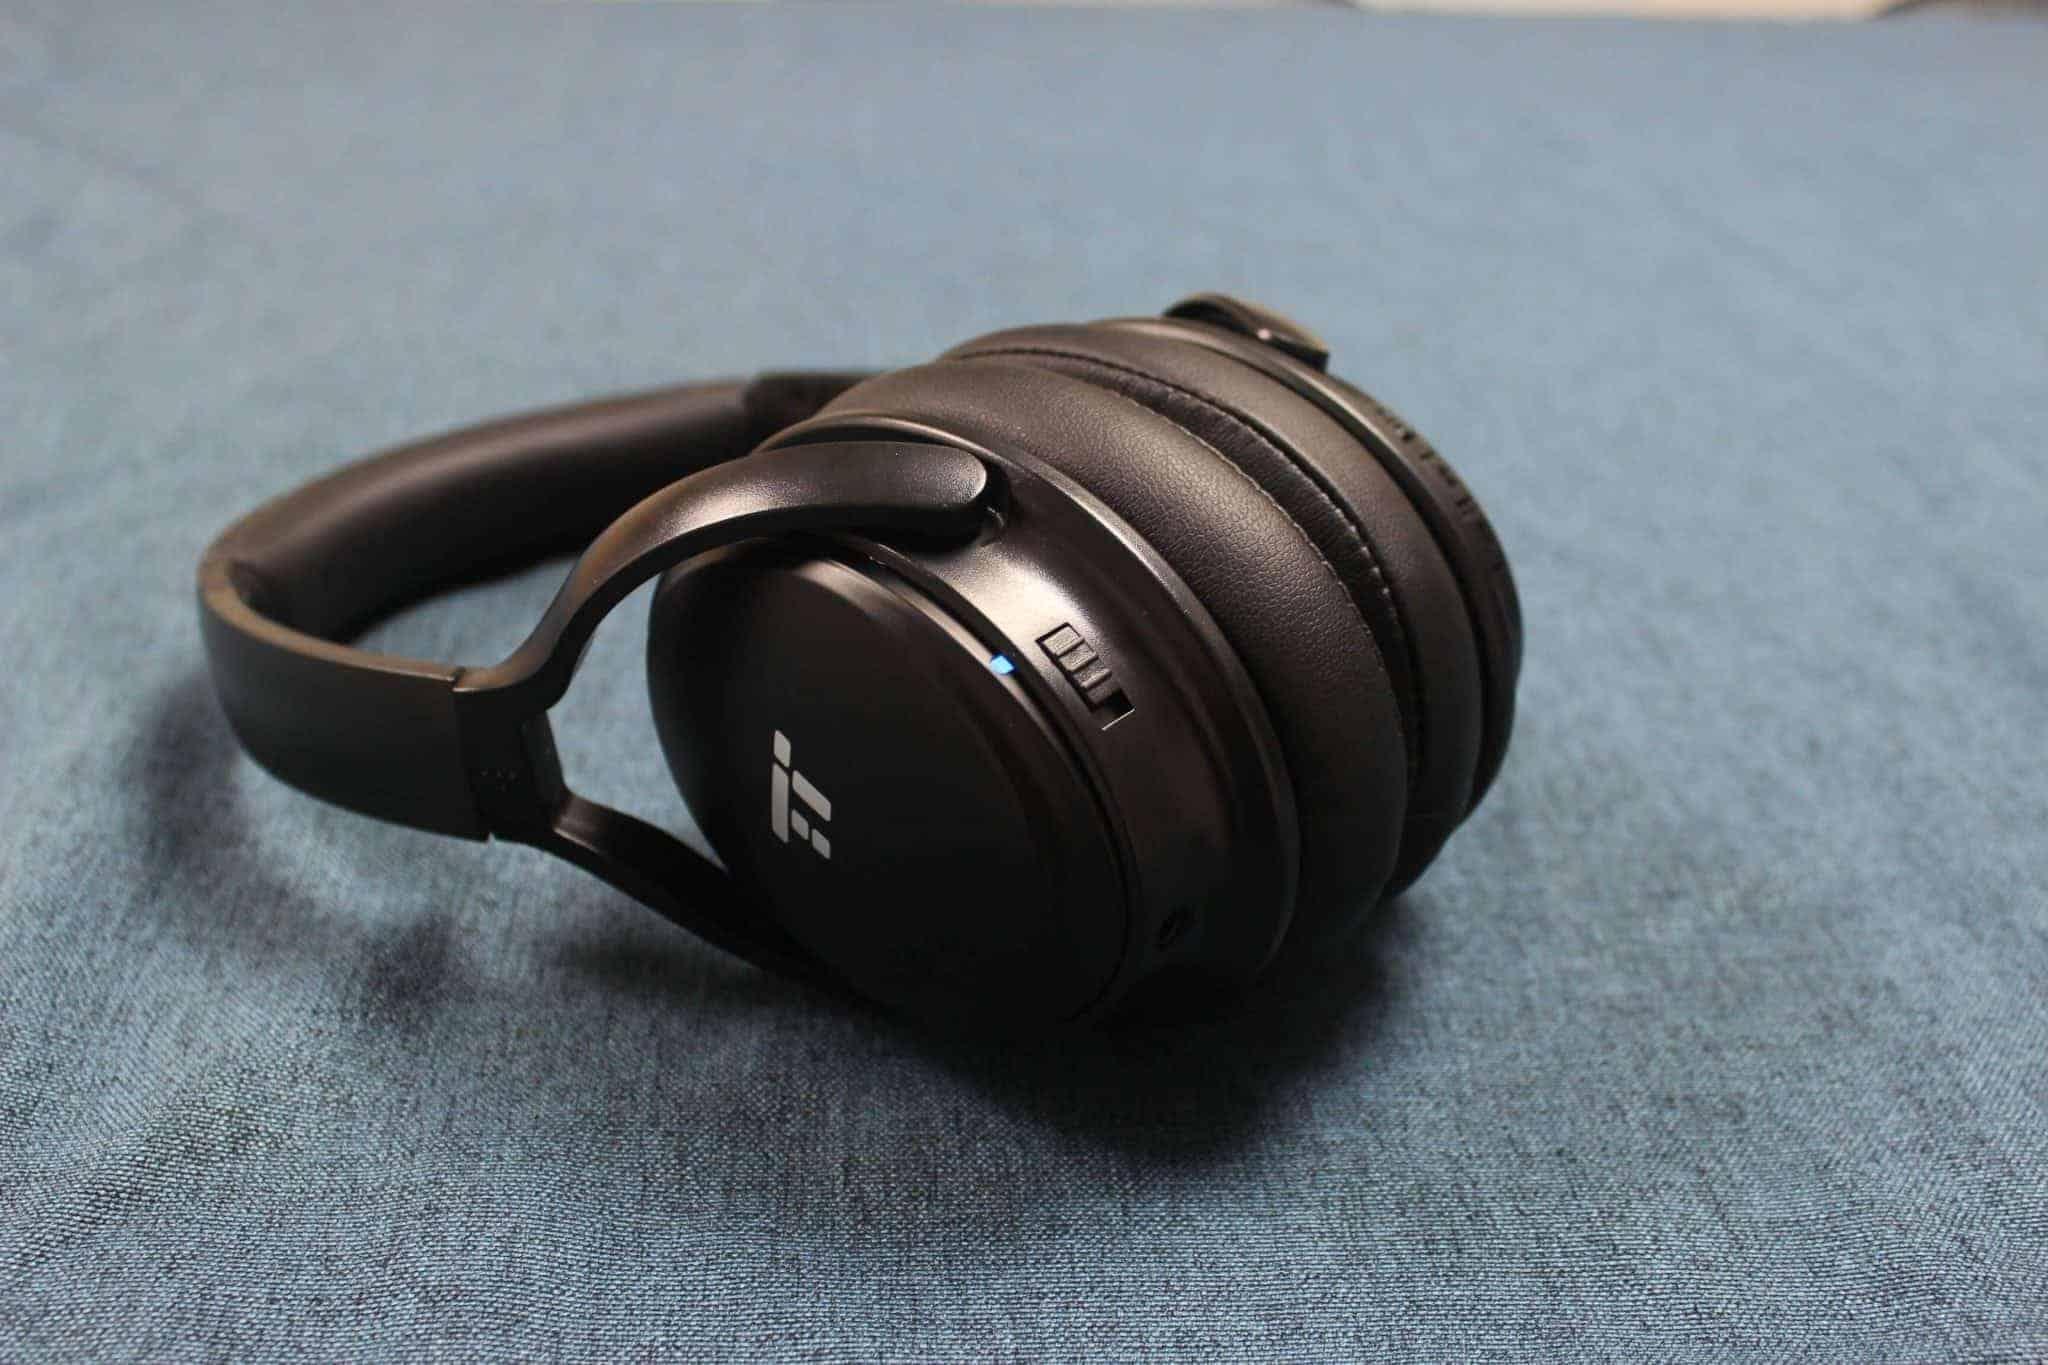 Bose以外的2019年CP值優先 降噪藍芽耳機選擇 ─ TaoTronics TT-BH22